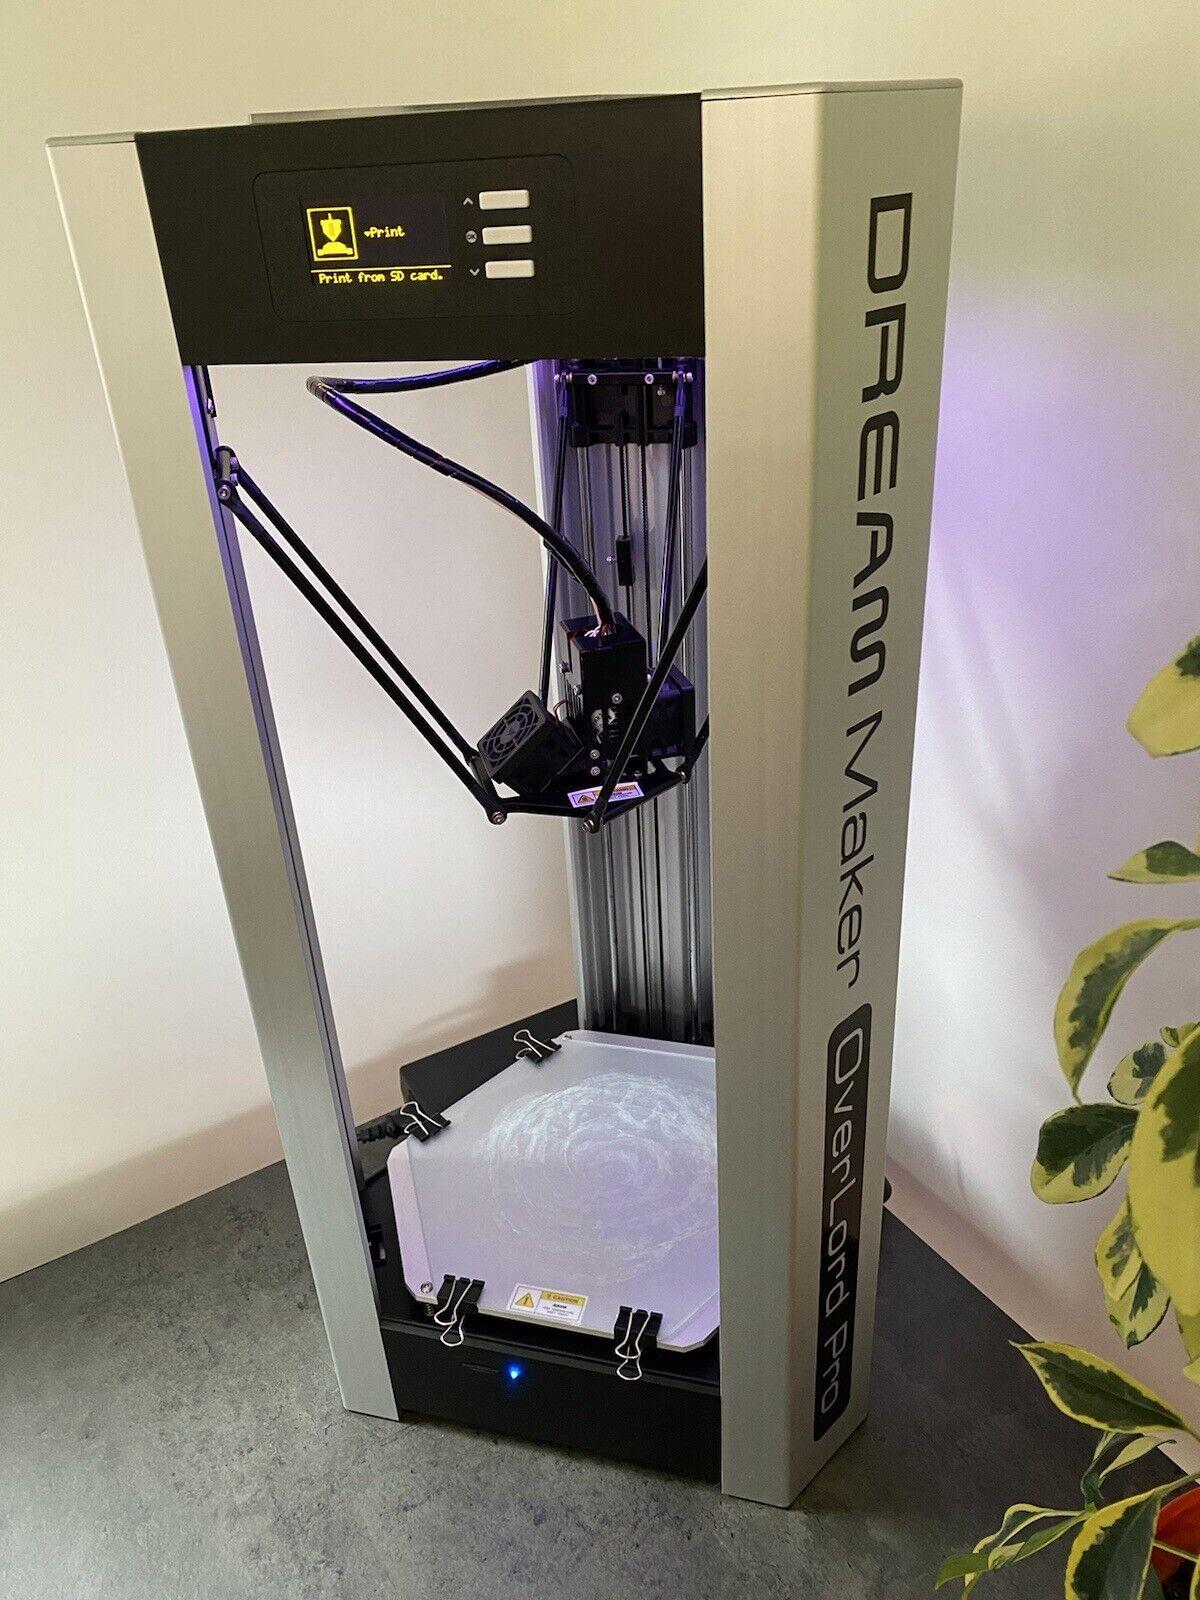 DreamMaker OverLord Pro 3D Printer